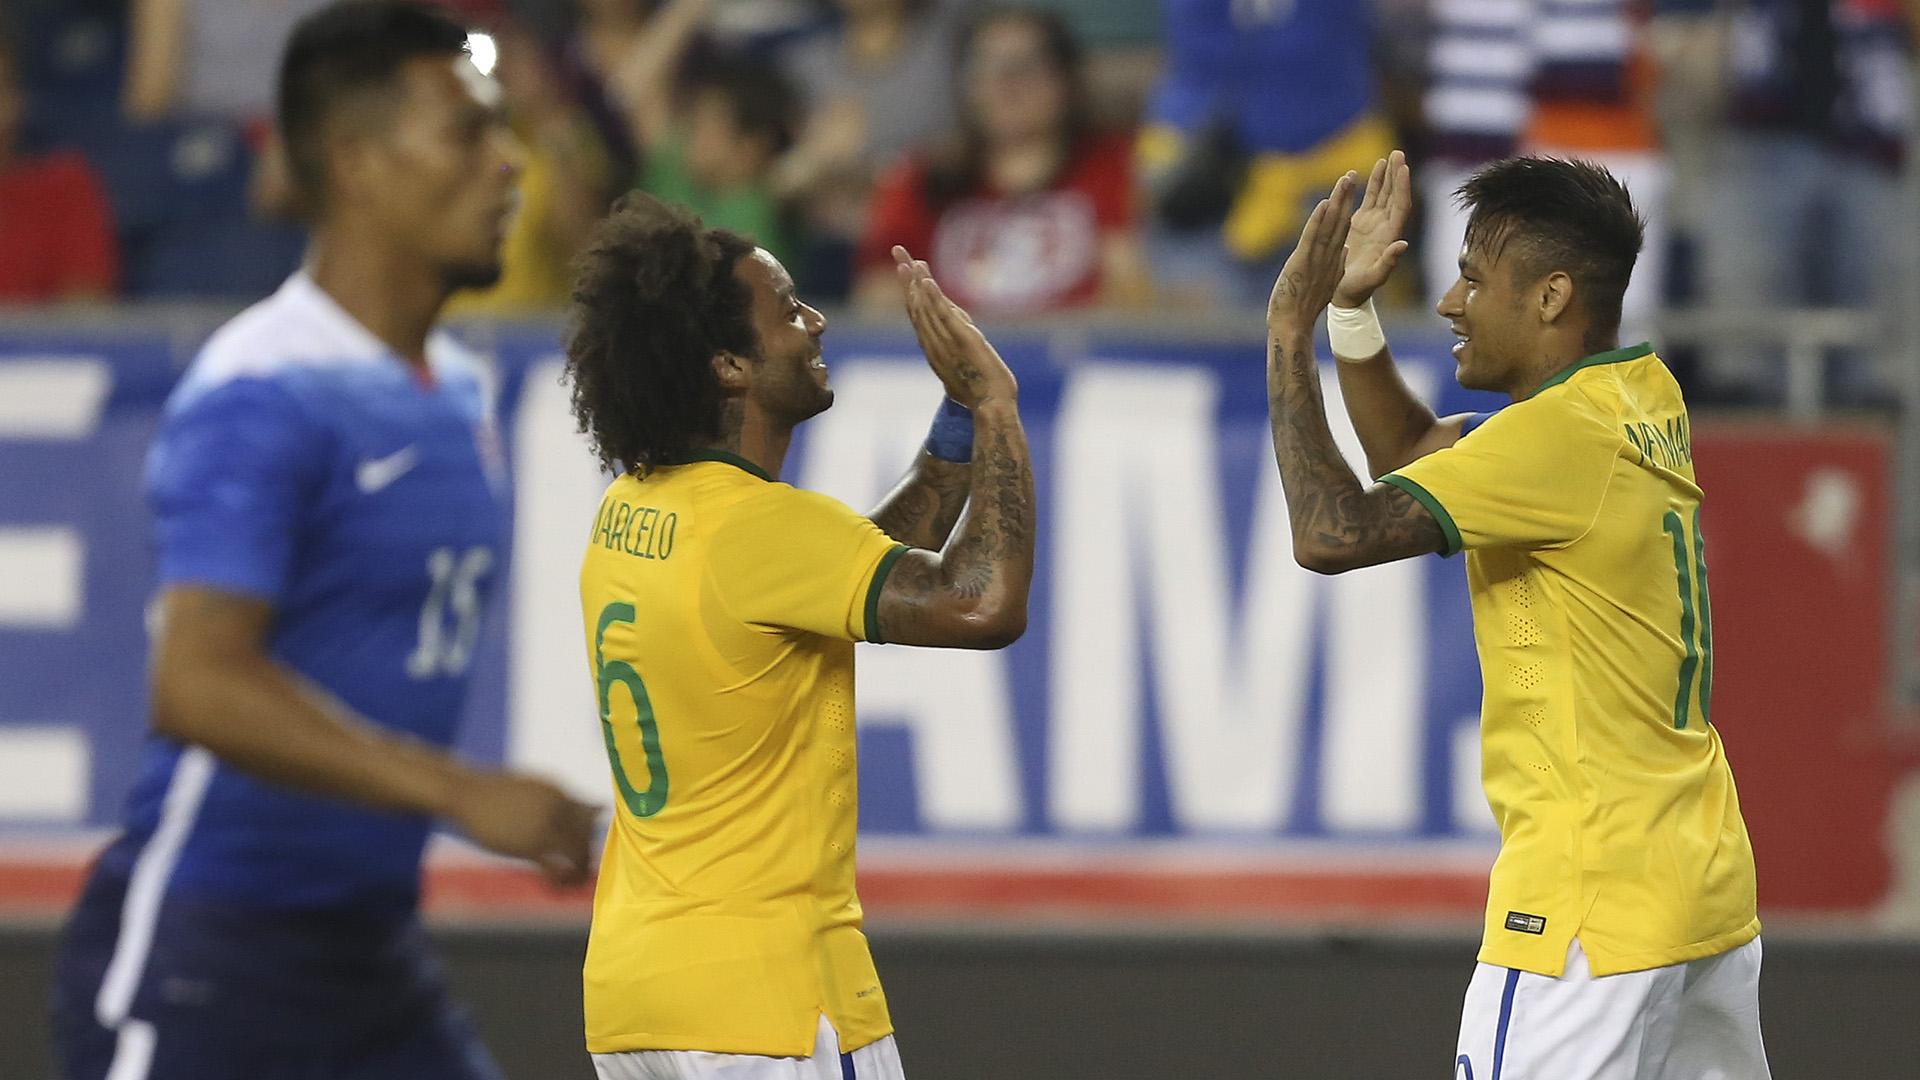 Marselo va Kazemiro Braziliya terma jamoasiga chaqirildi